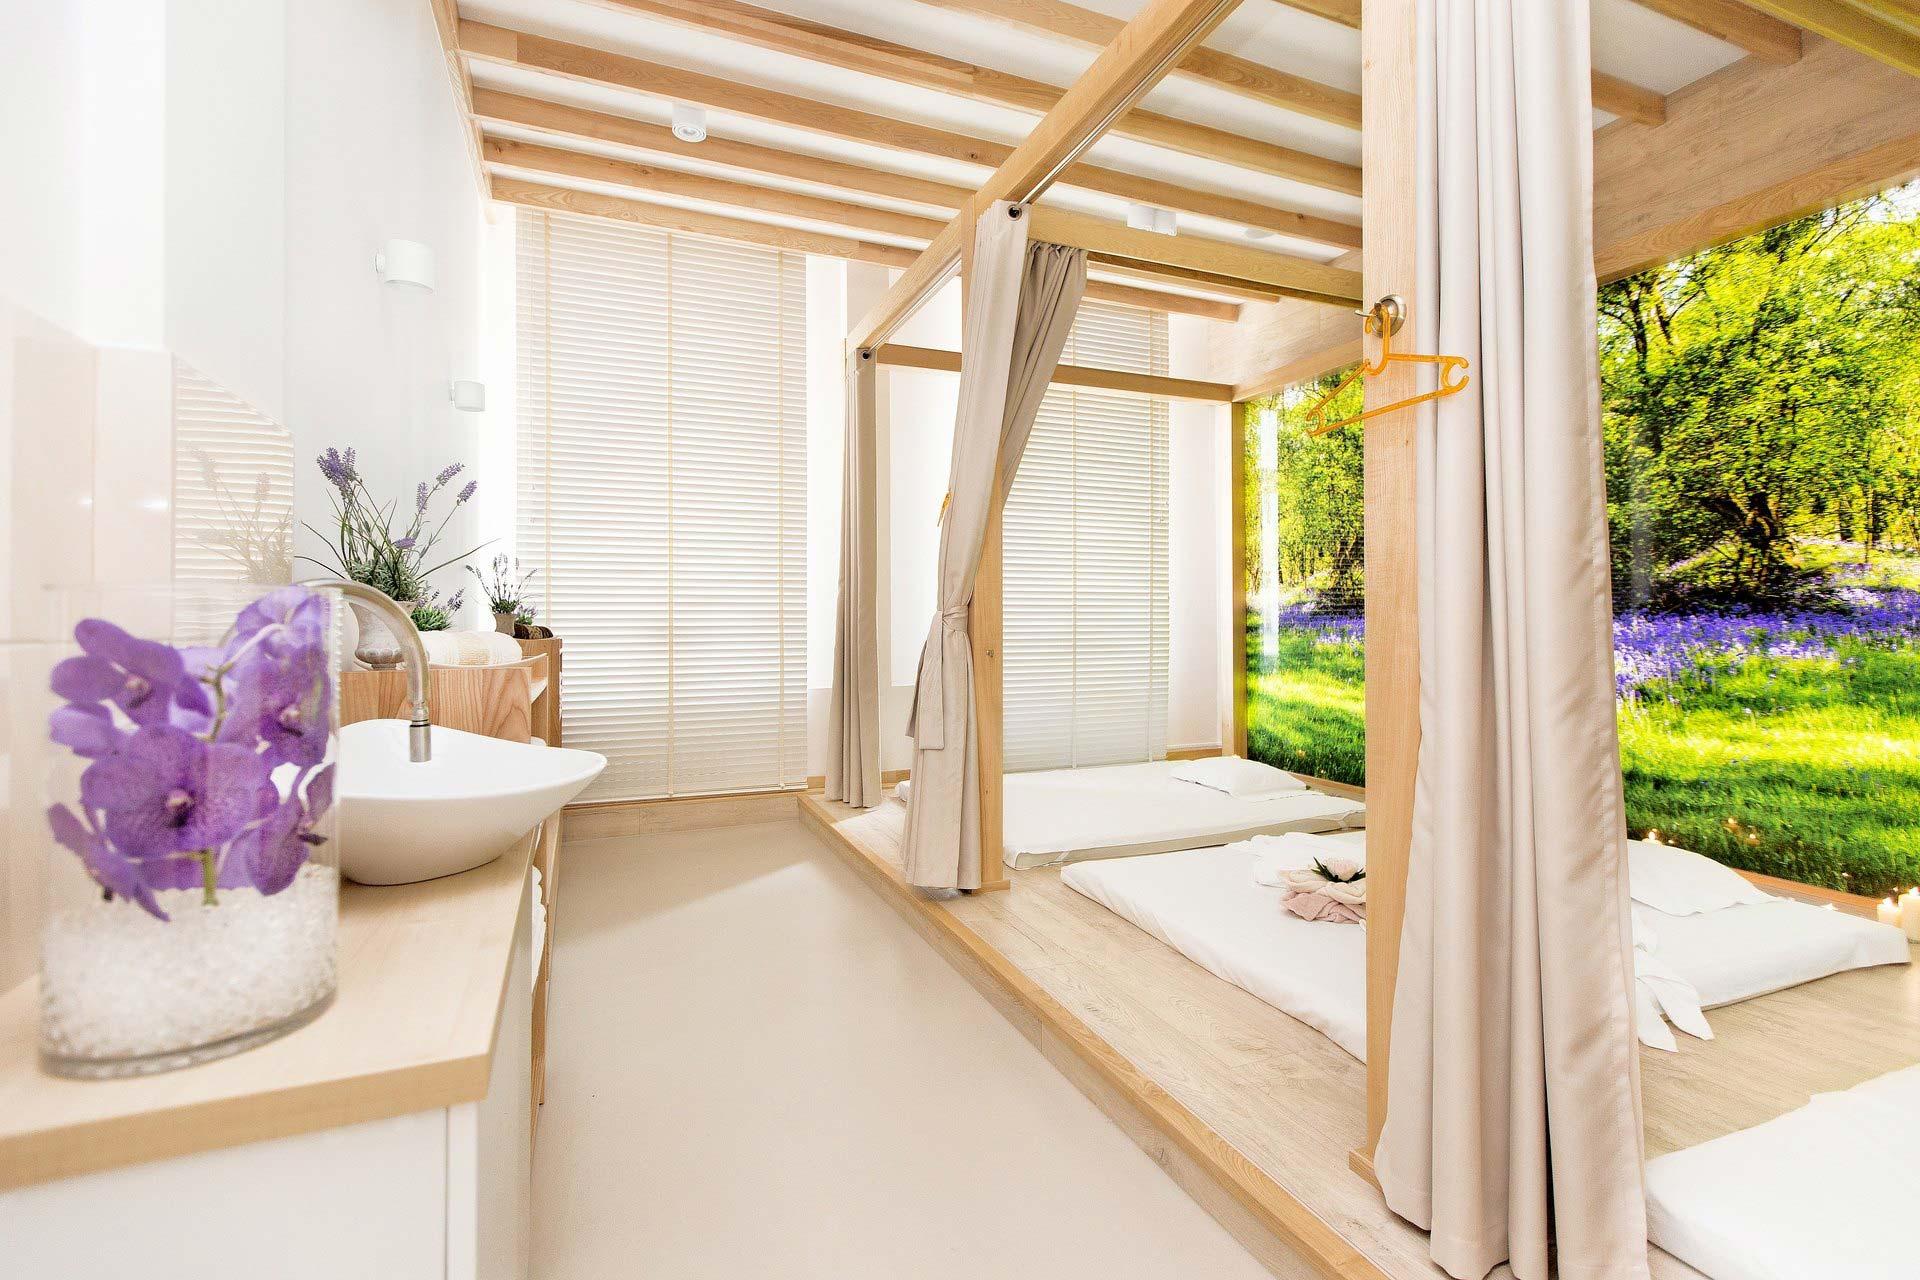 innenjalousien aus alu holz oder bambus. Black Bedroom Furniture Sets. Home Design Ideas